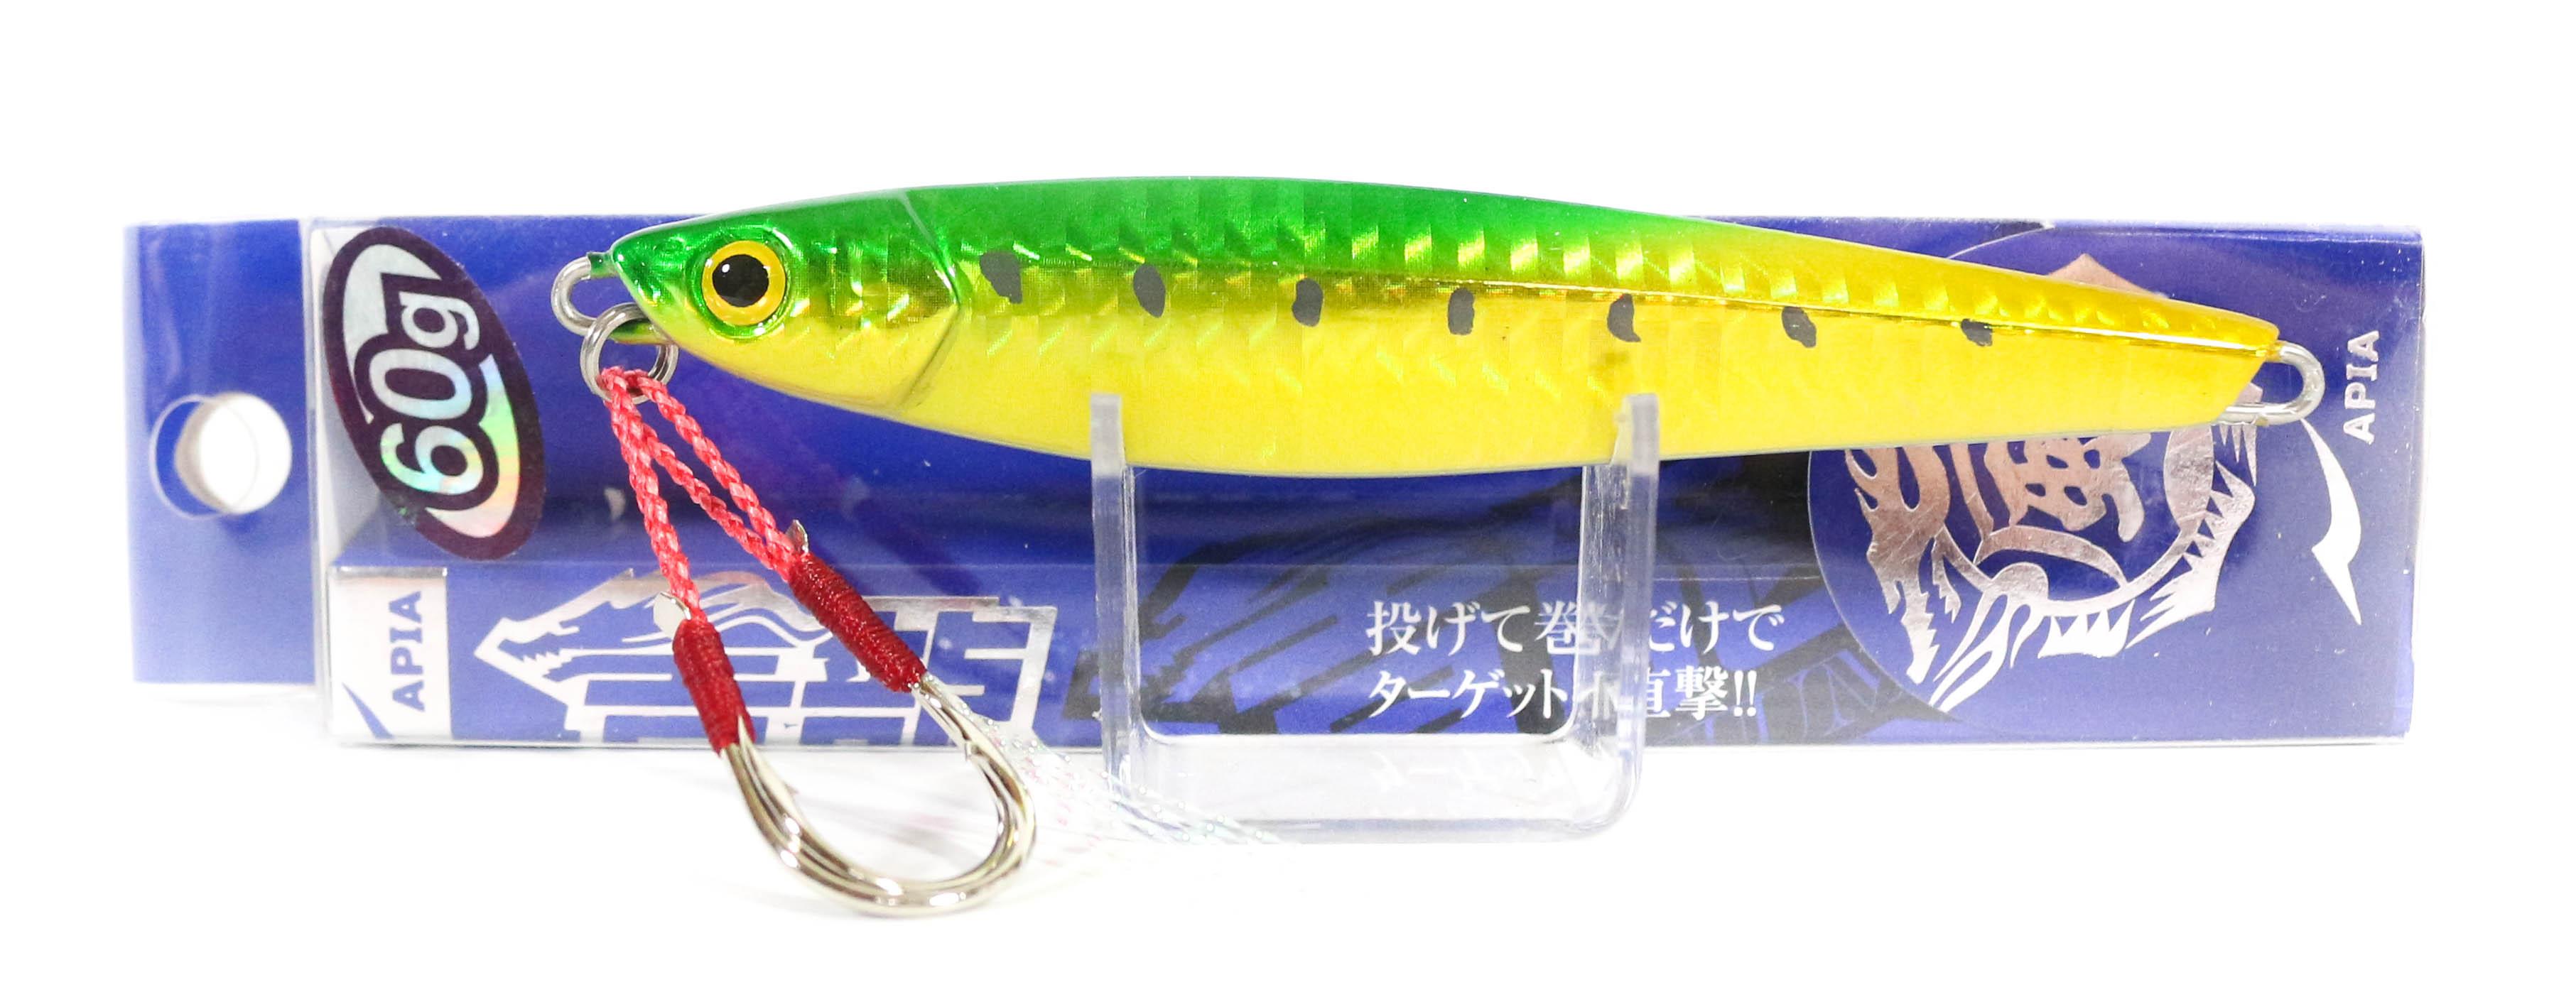 Sale Apia Metal Jig Seiryu Premium 60 grams 48 (8733)